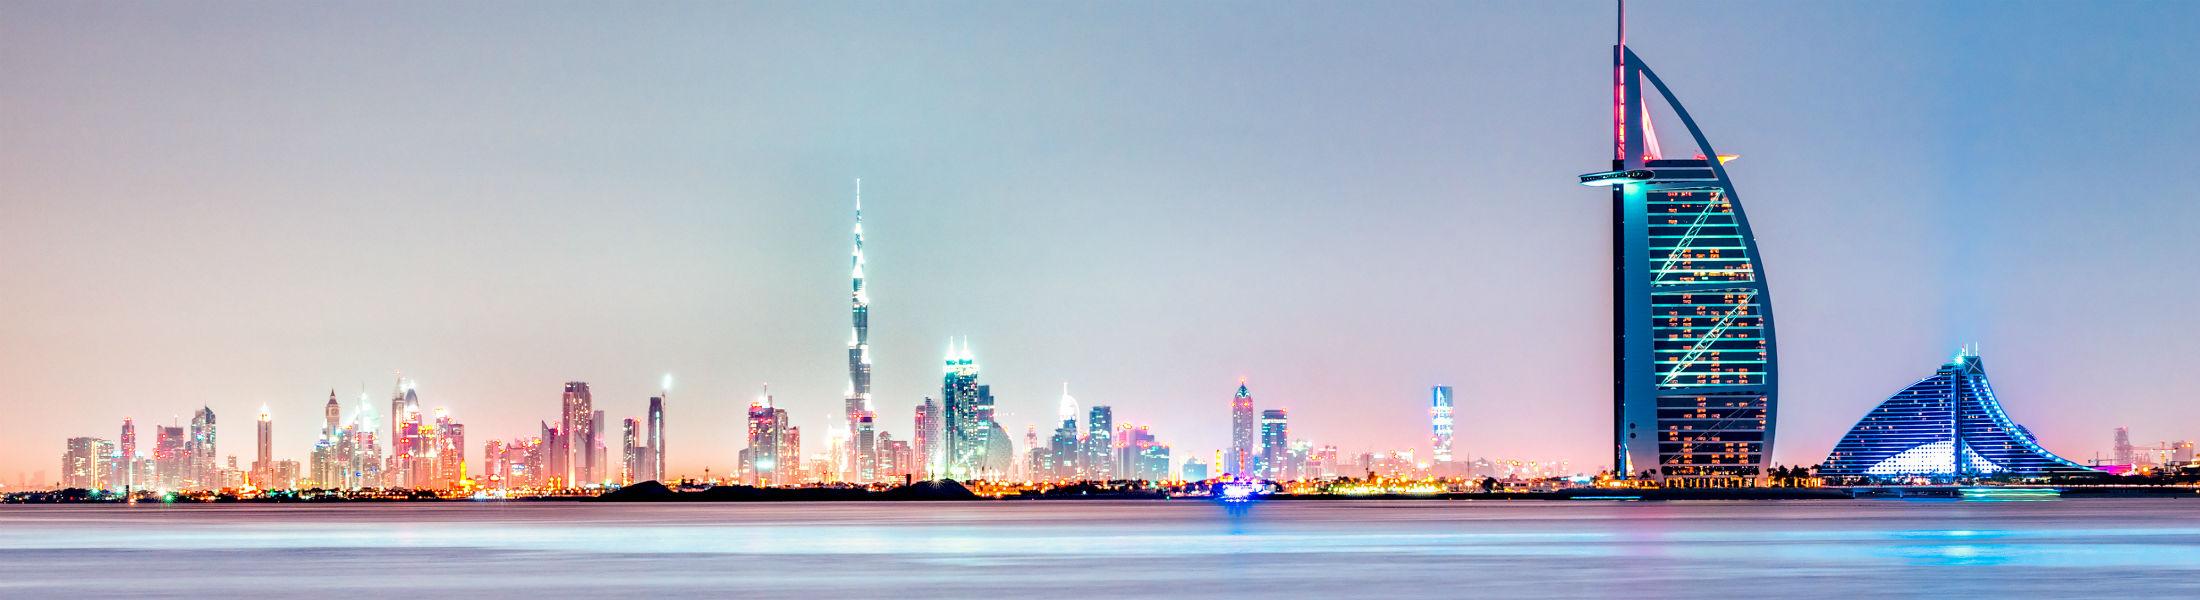 Dubai - View of city and Burj Khalifa